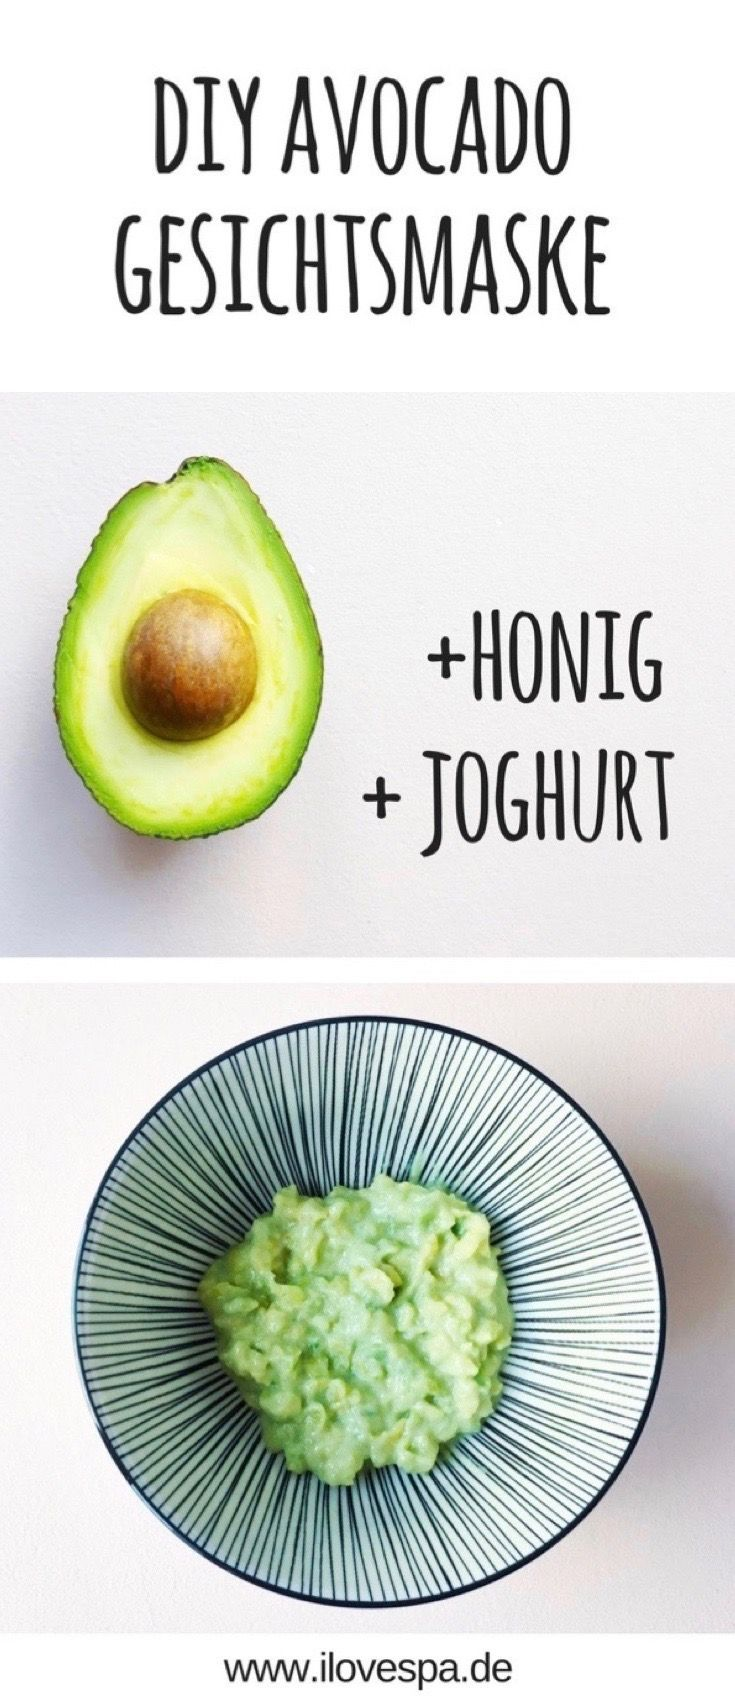 Diy Avocado Maske Selber Machen Perfekt Geeignet Für Trockene Haut